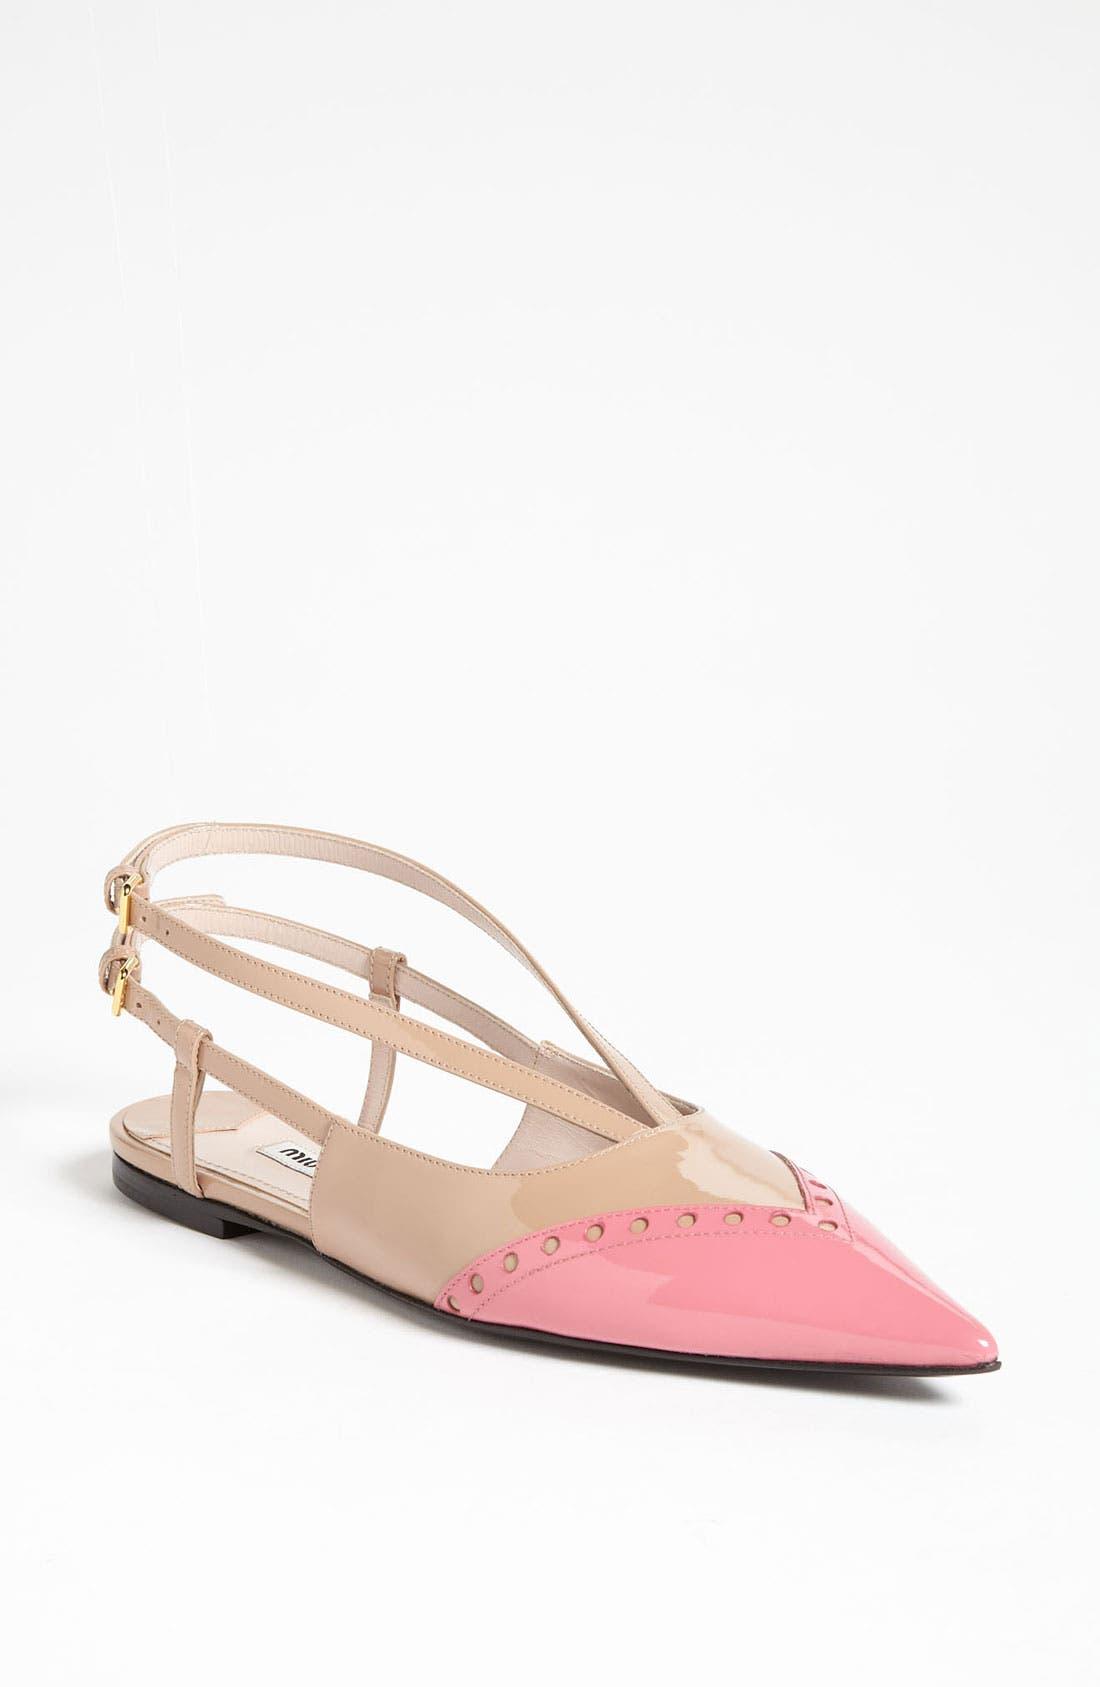 Alternate Image 1 Selected - Miu Miu Pointed Toe Ballet Flat